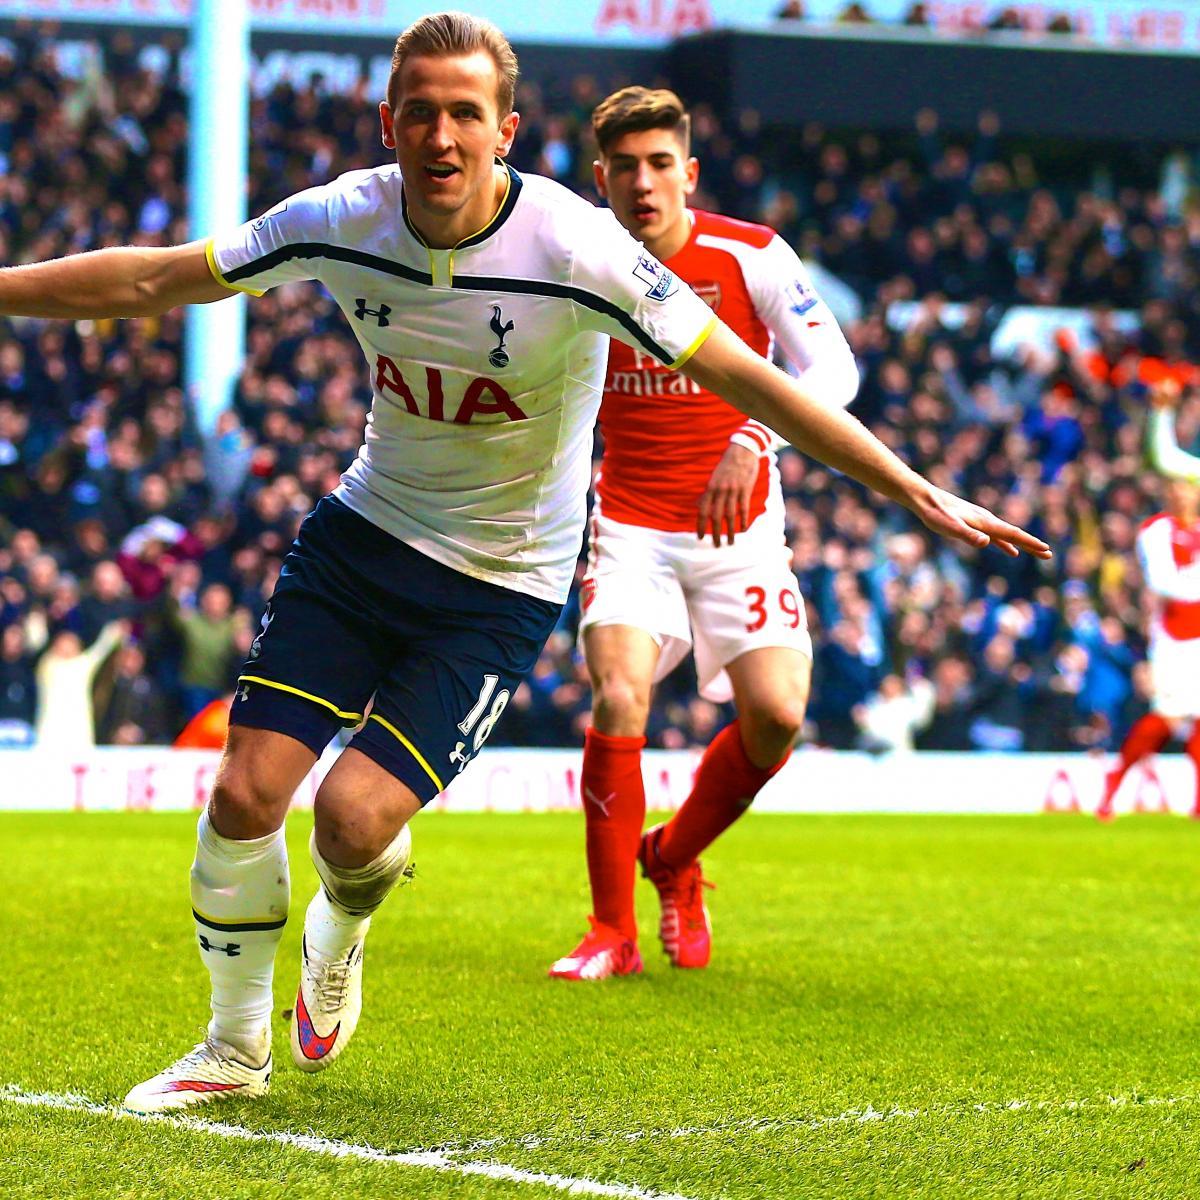 Arsenal Vs Tottenham Live Score Highlights From Premier: Tottenham Vs. Arsenal: Score, Grades, Reaction From North